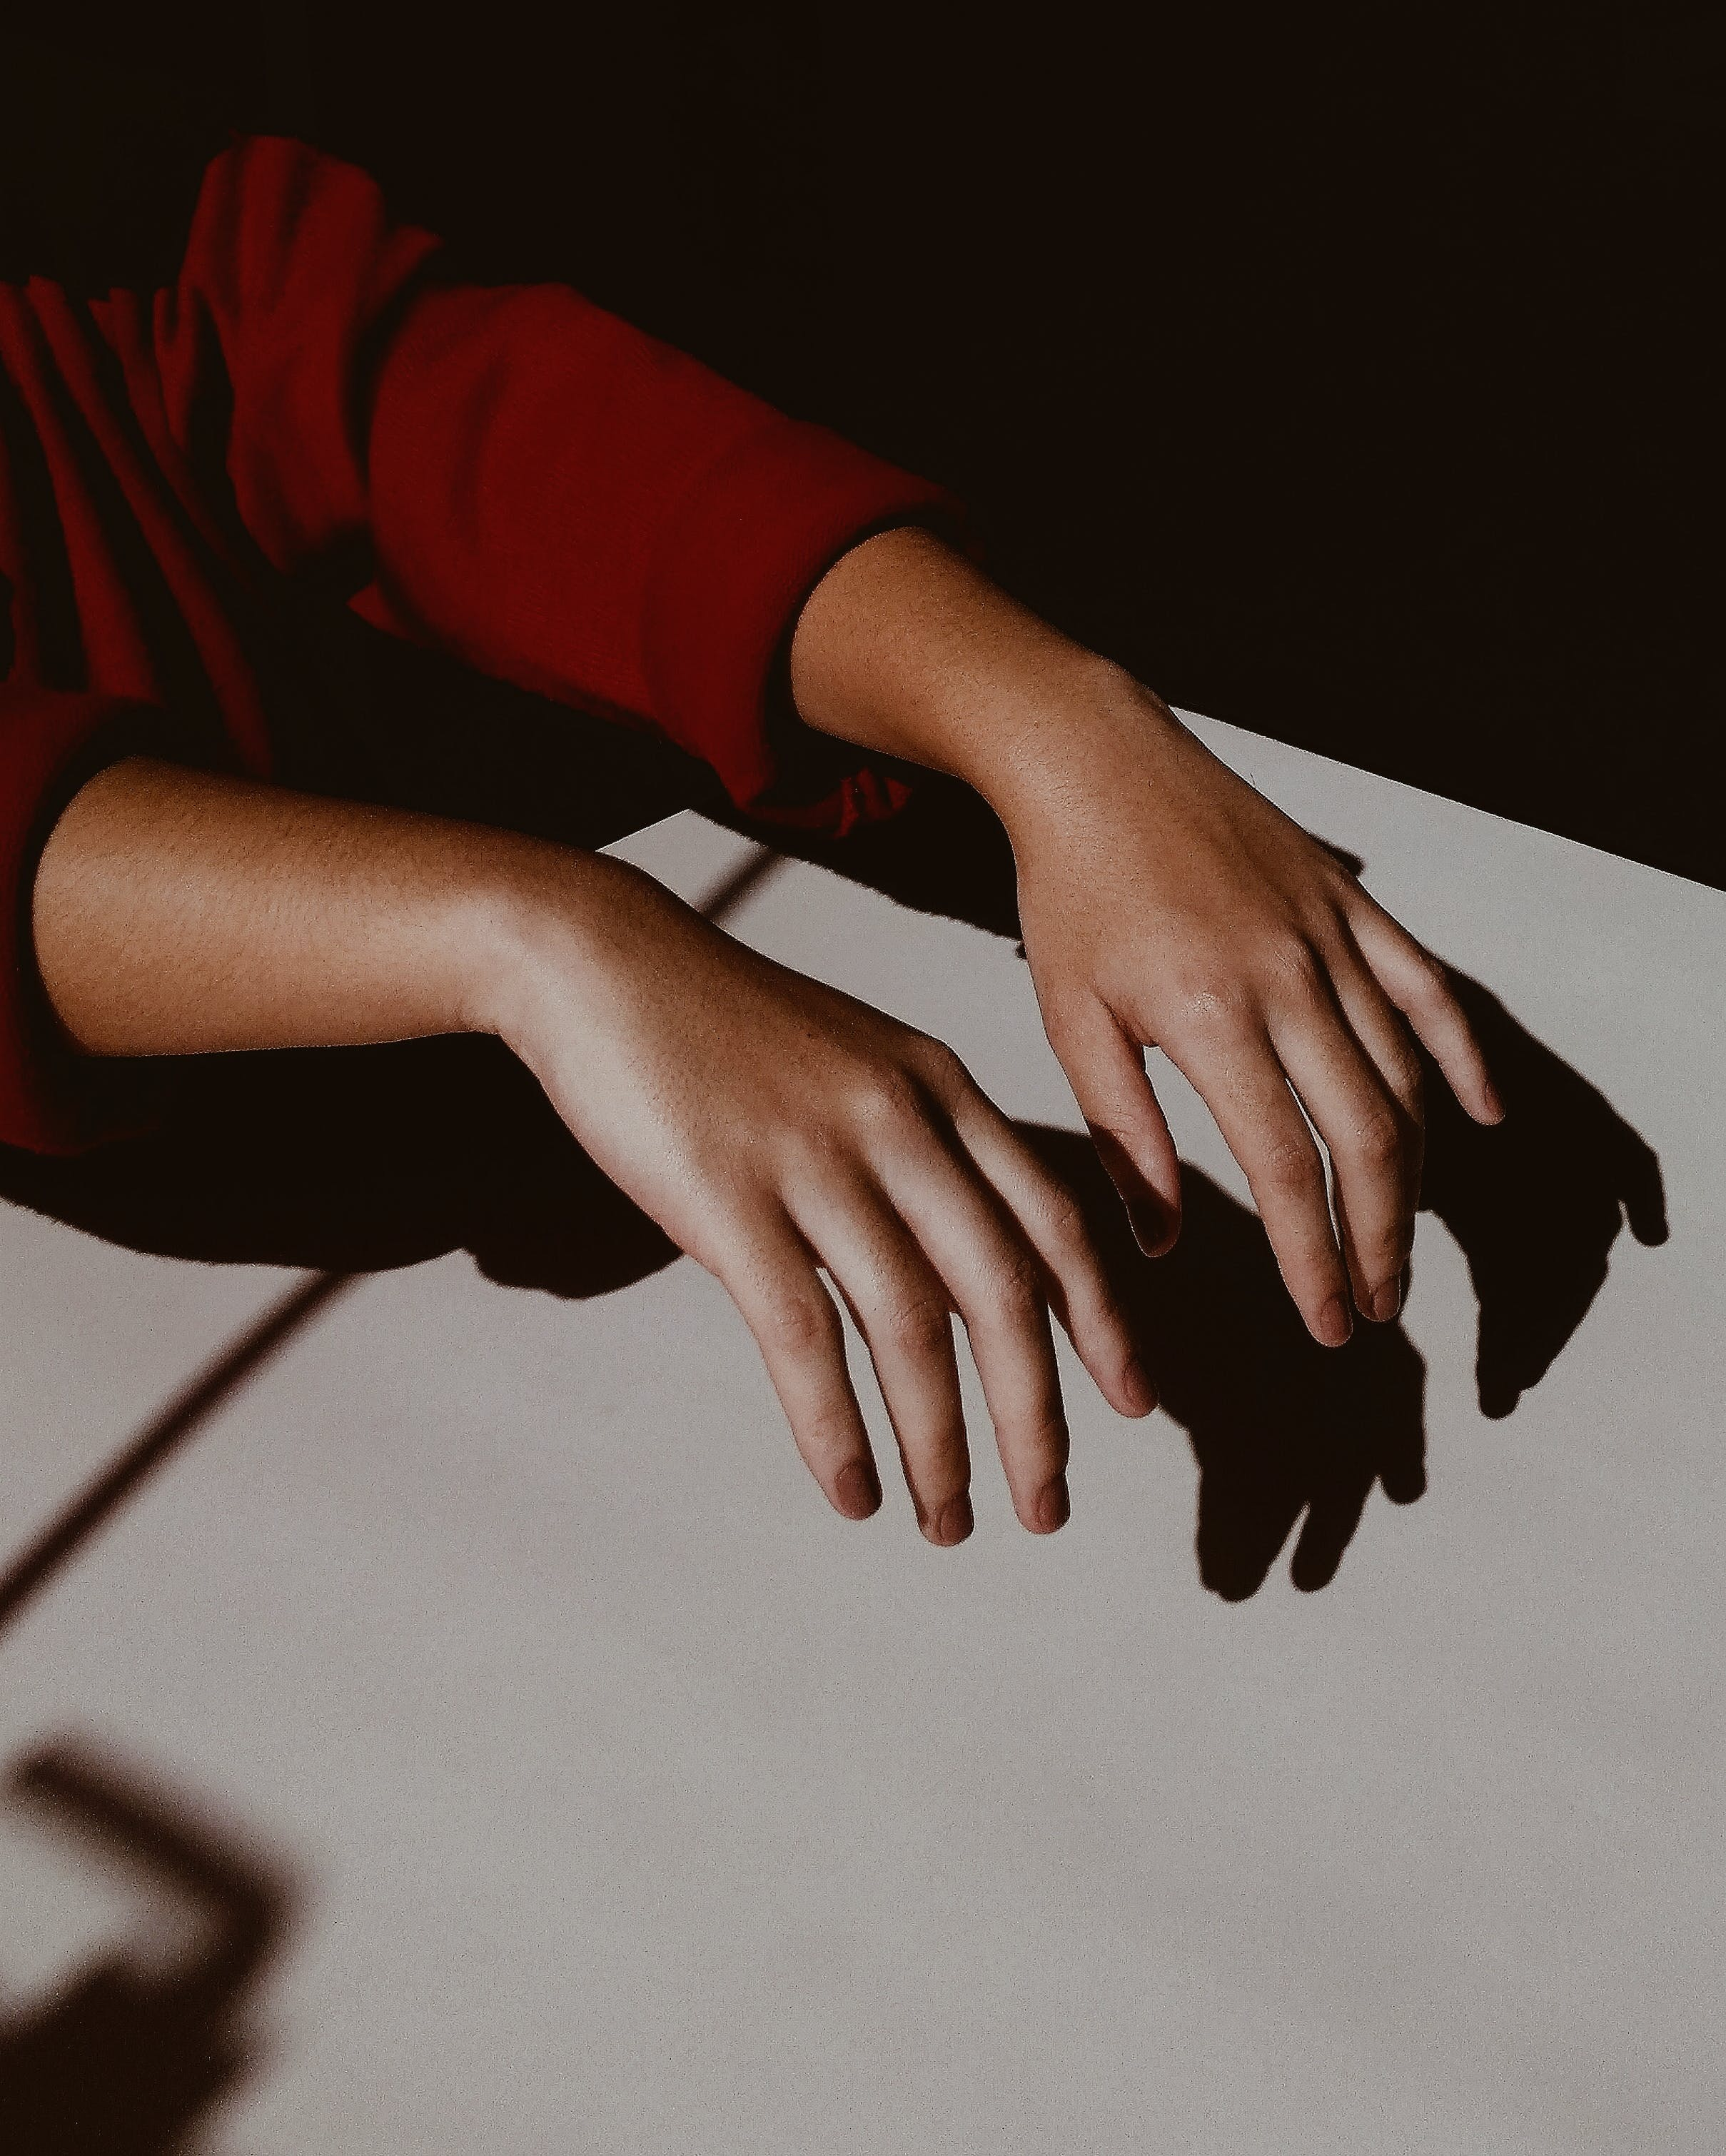 Gratis lagerfoto af hænder, person, skygge